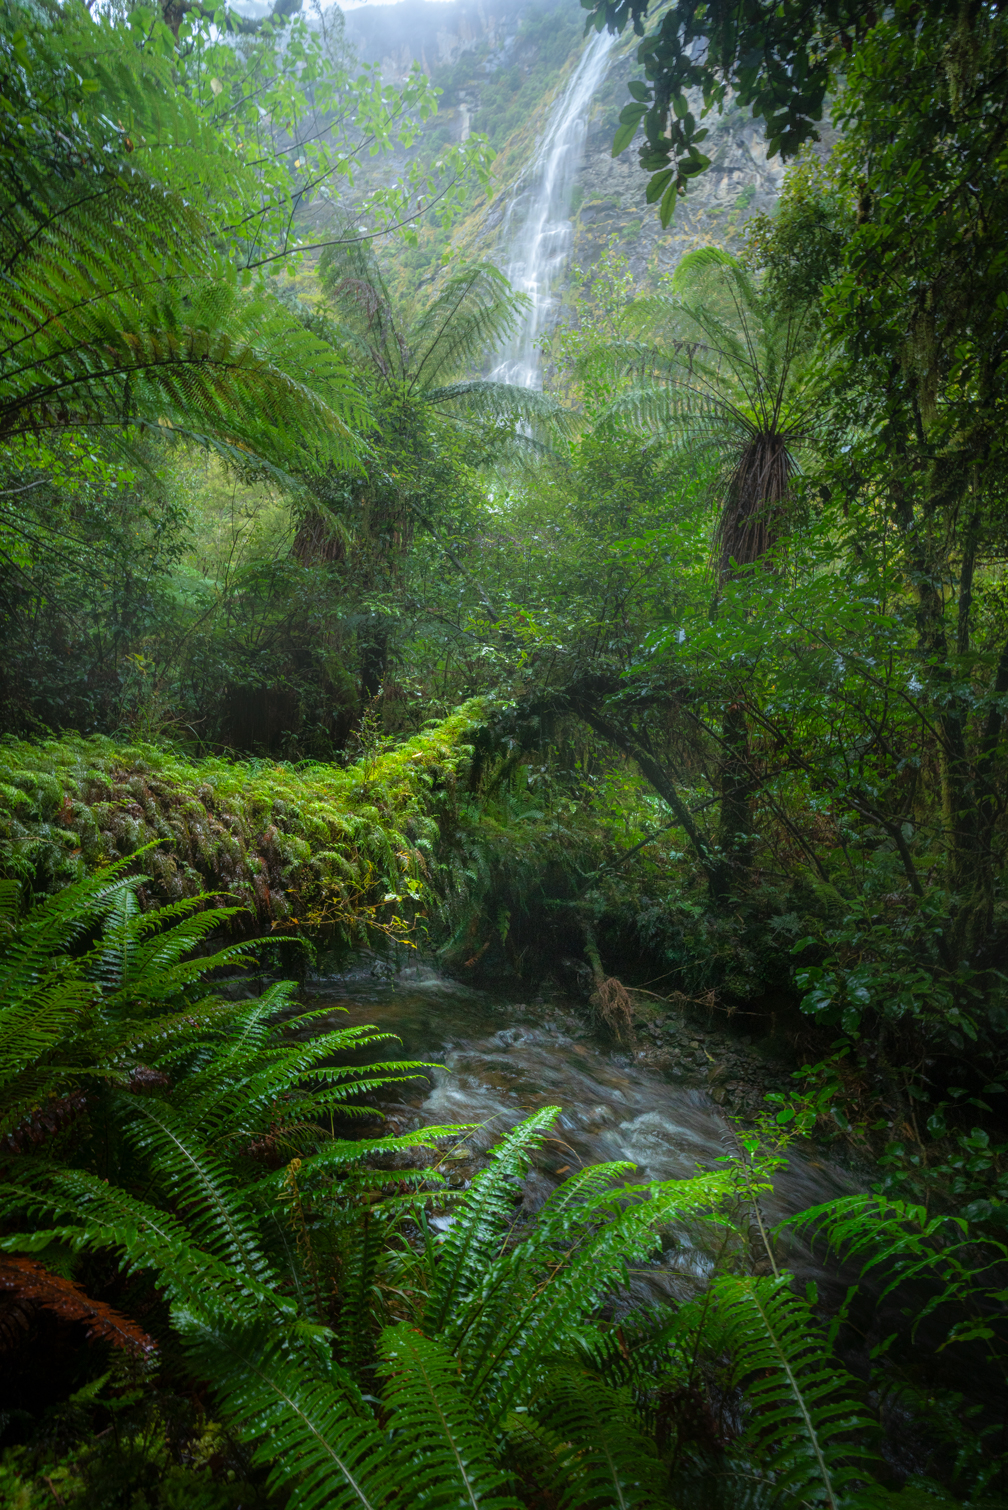 Fiordland Waterfall and rainforest, Copyright William Patino, New Zealand Landscape Photographer